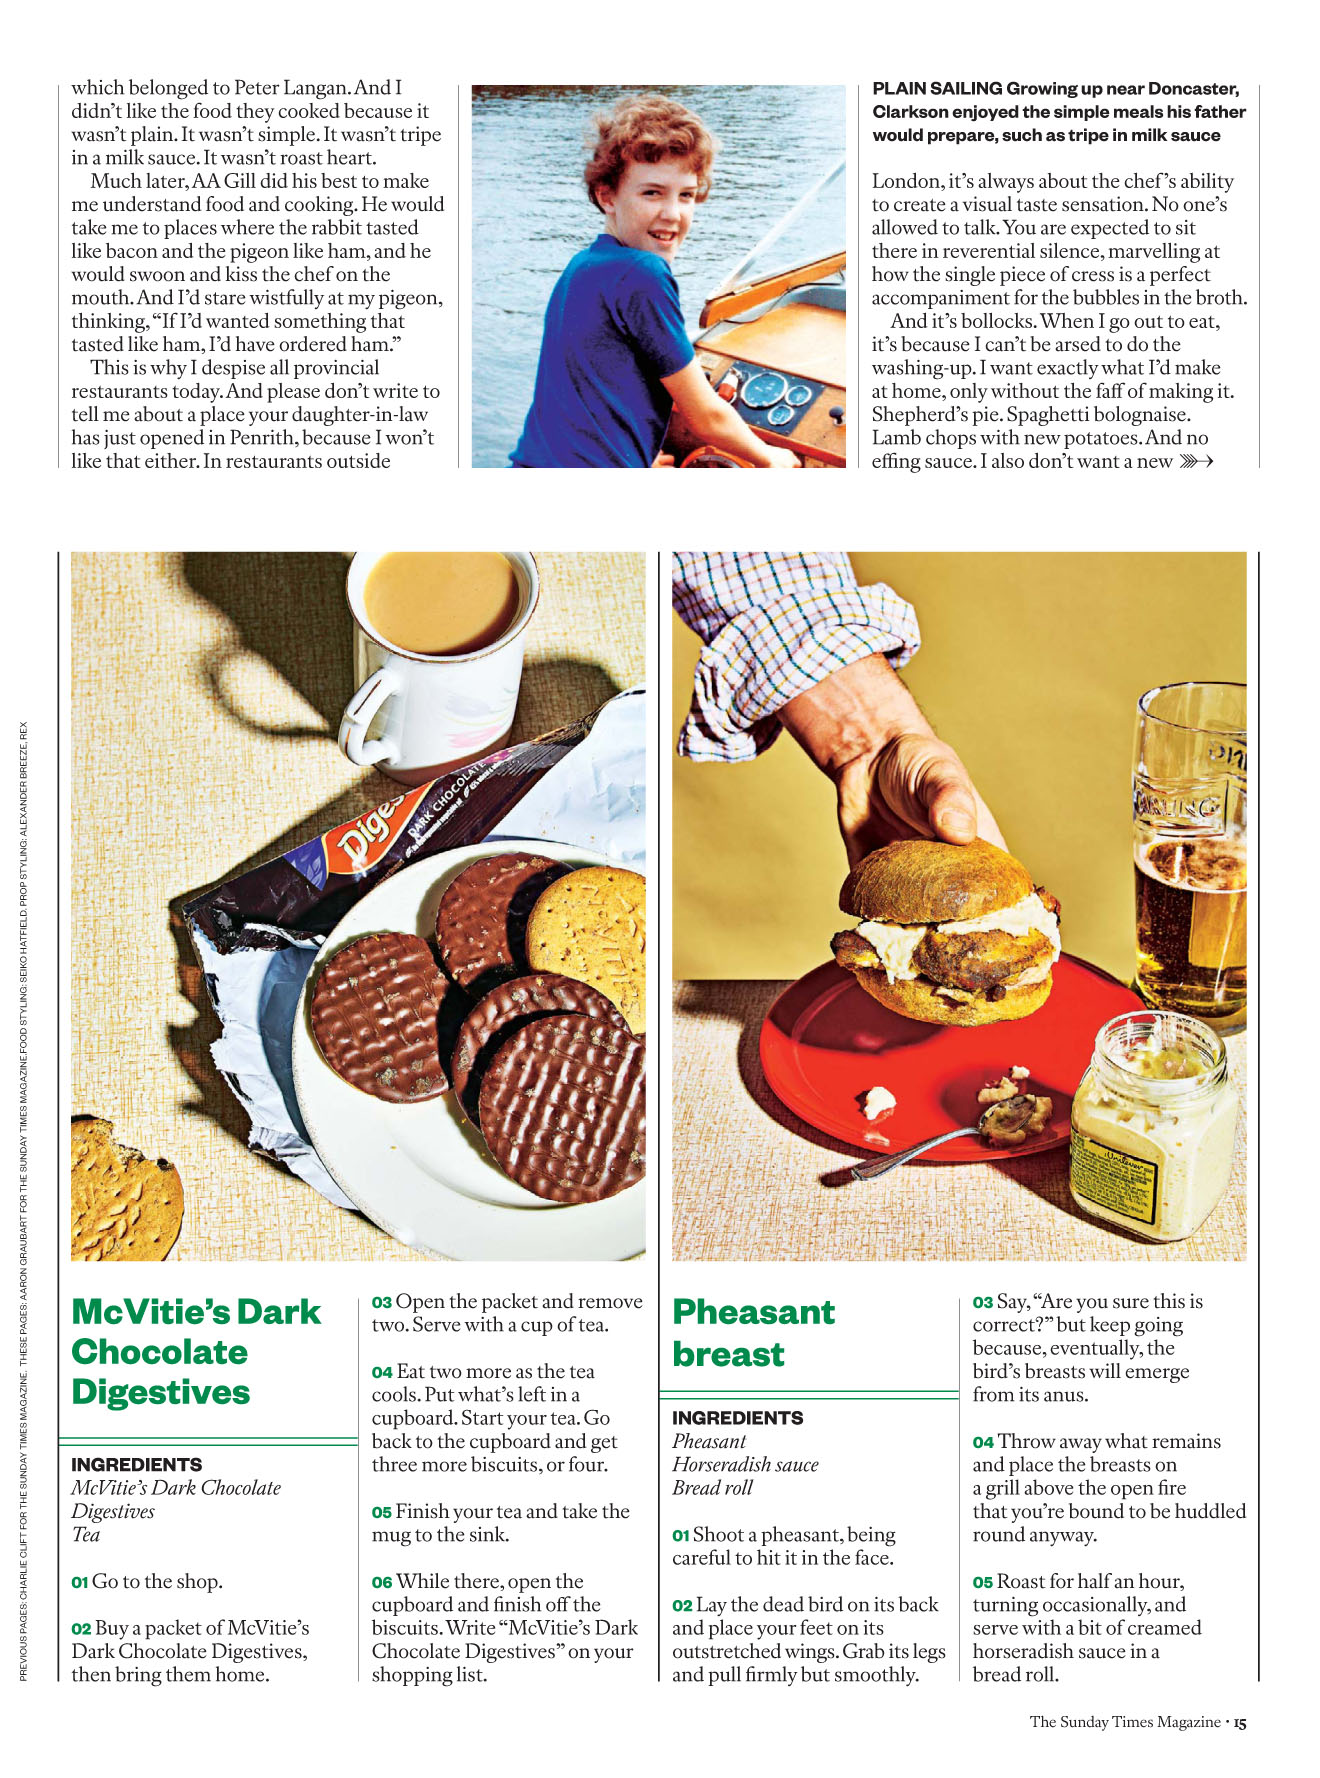 The Sunday Times Magazine 200301 JClarkson-4.jpg